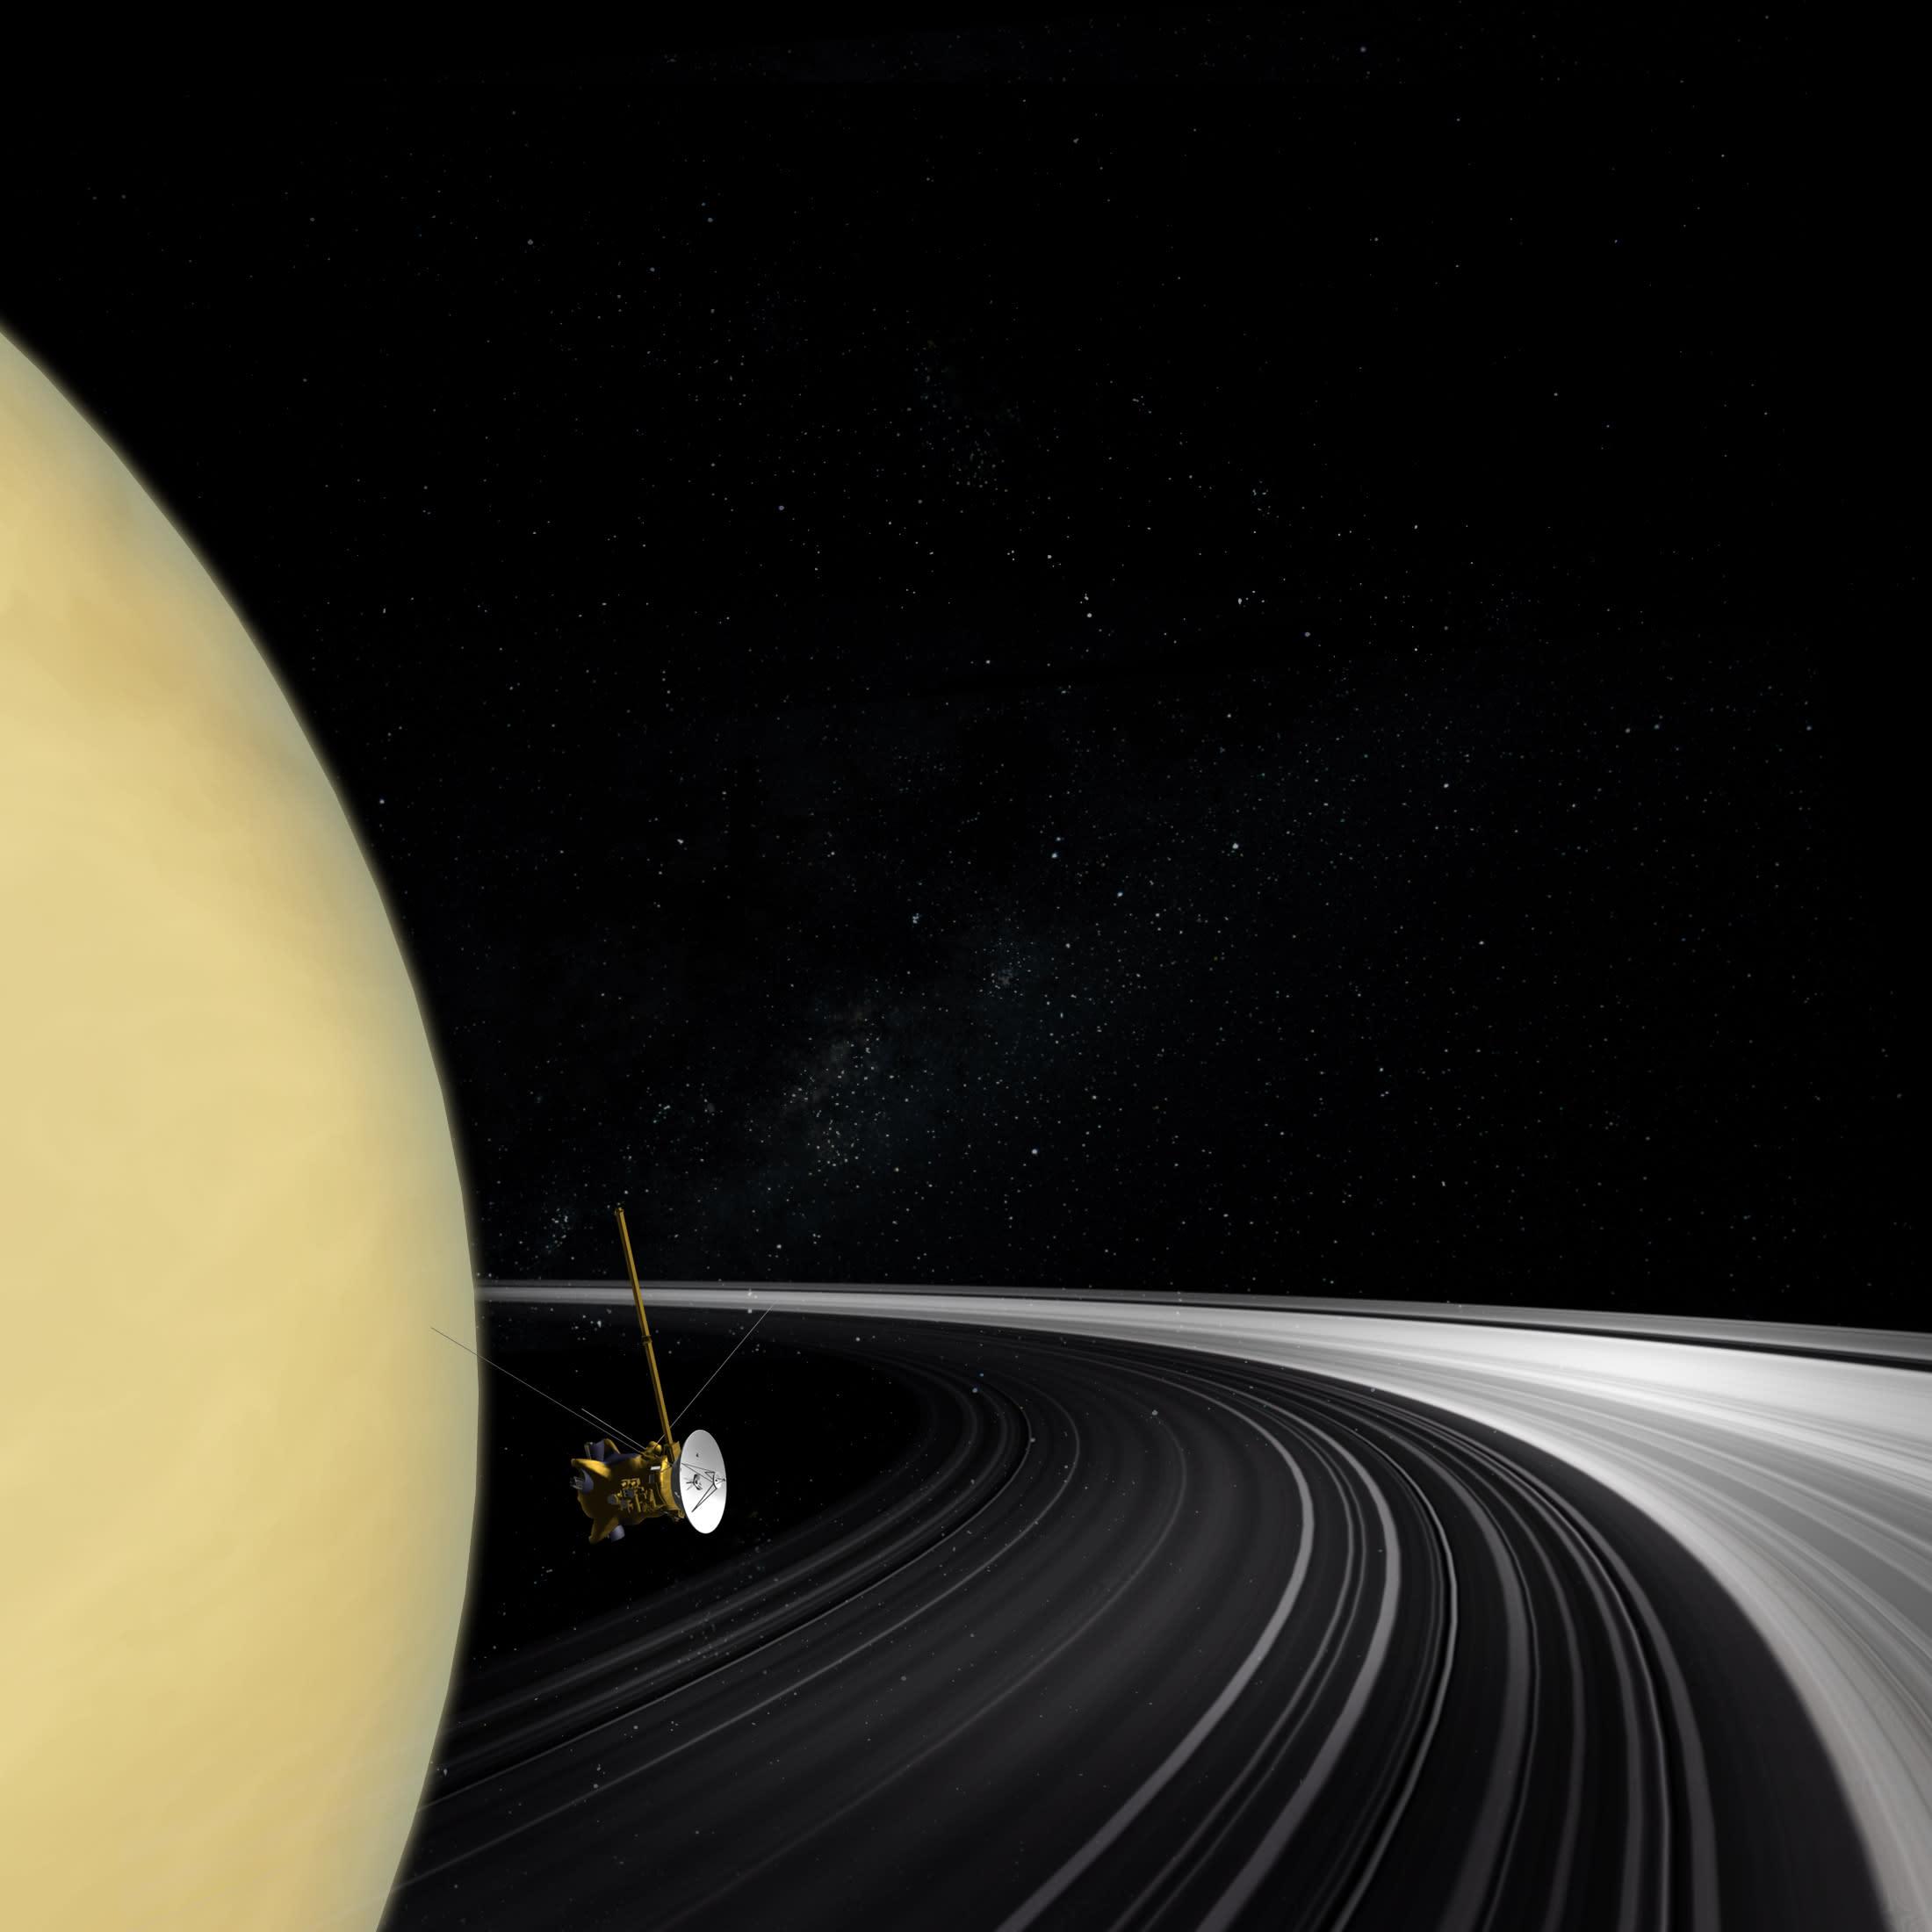 saturn cassini spacecraft - HD2200×2200